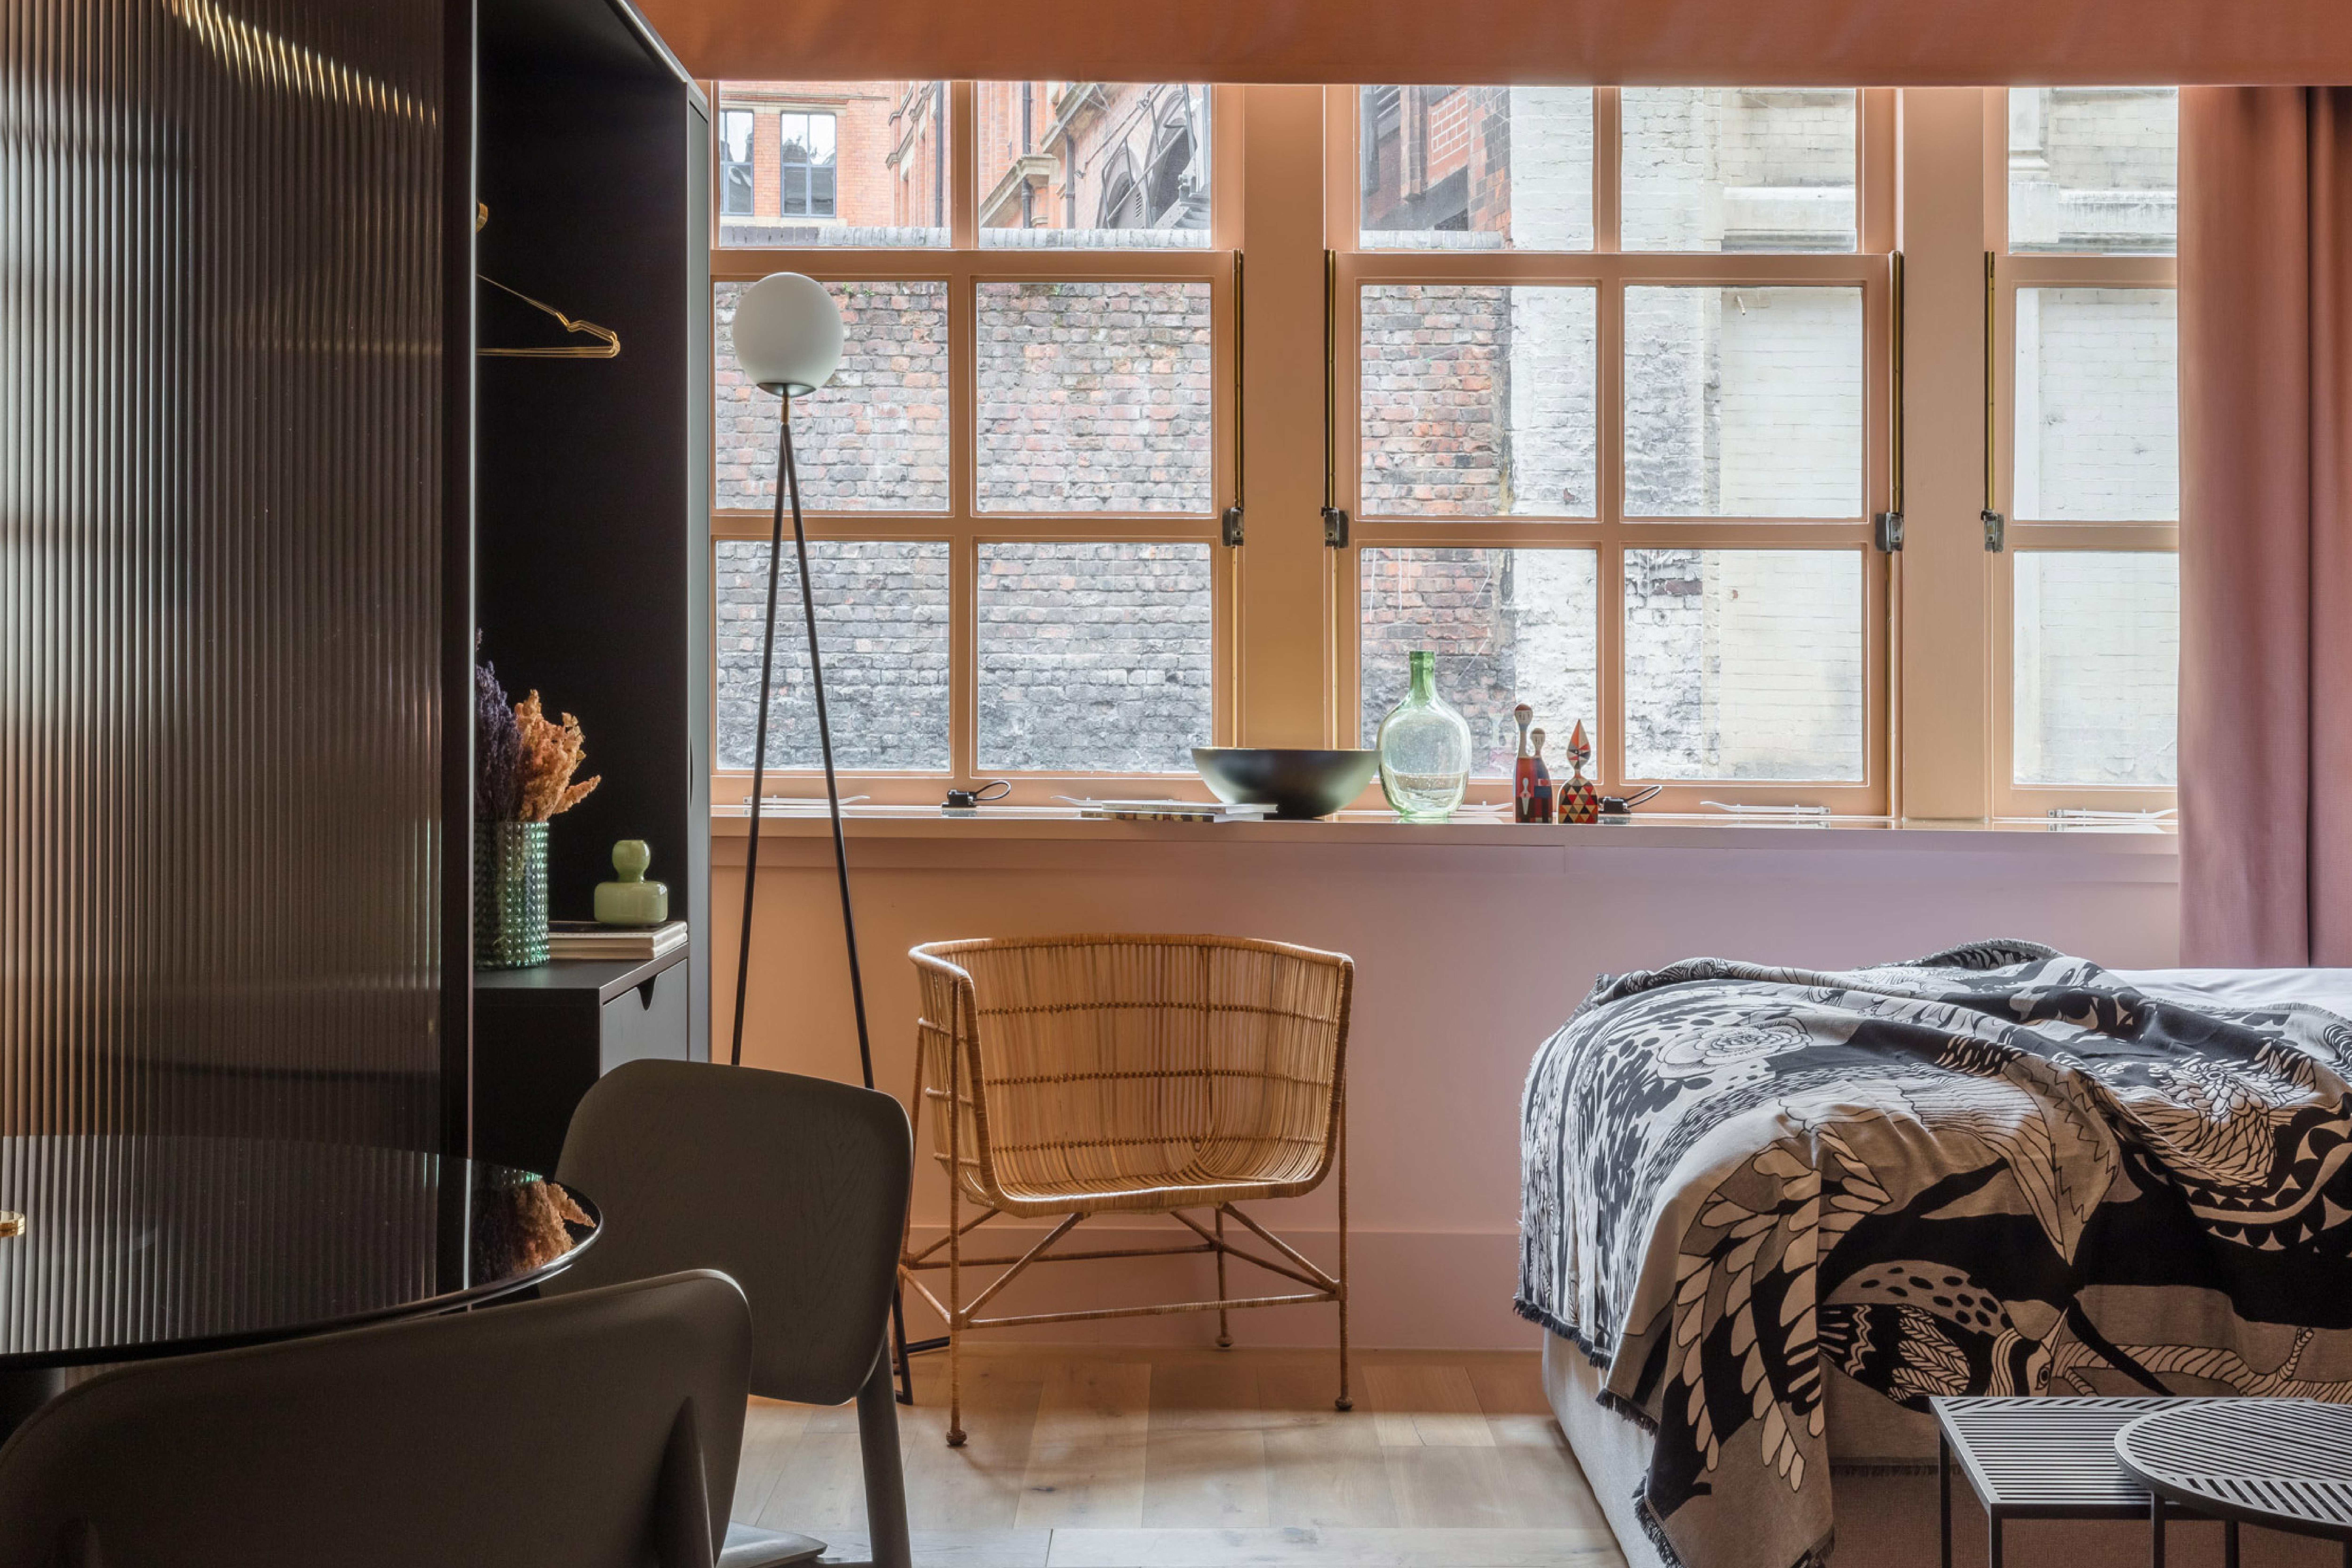 nl 6|2019 pinkhotels